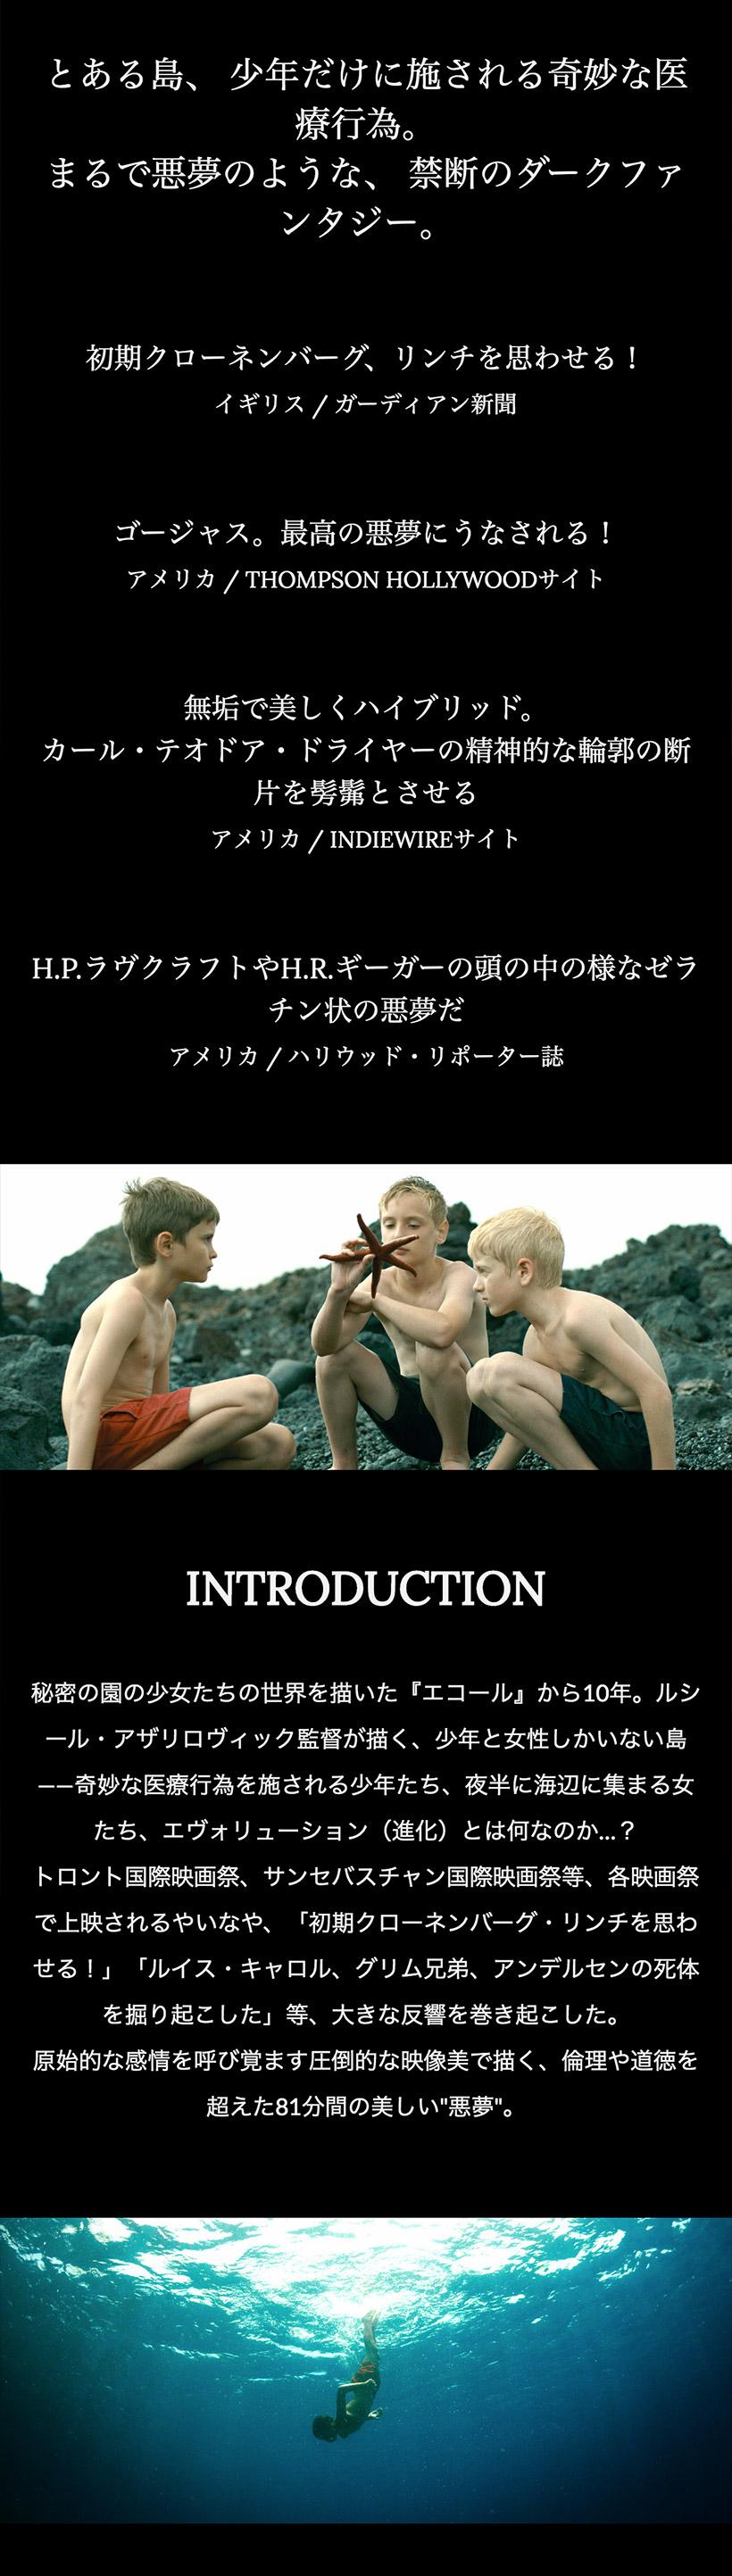 Sister x ルシール・アザリロヴィック監督 「エヴォリューション」